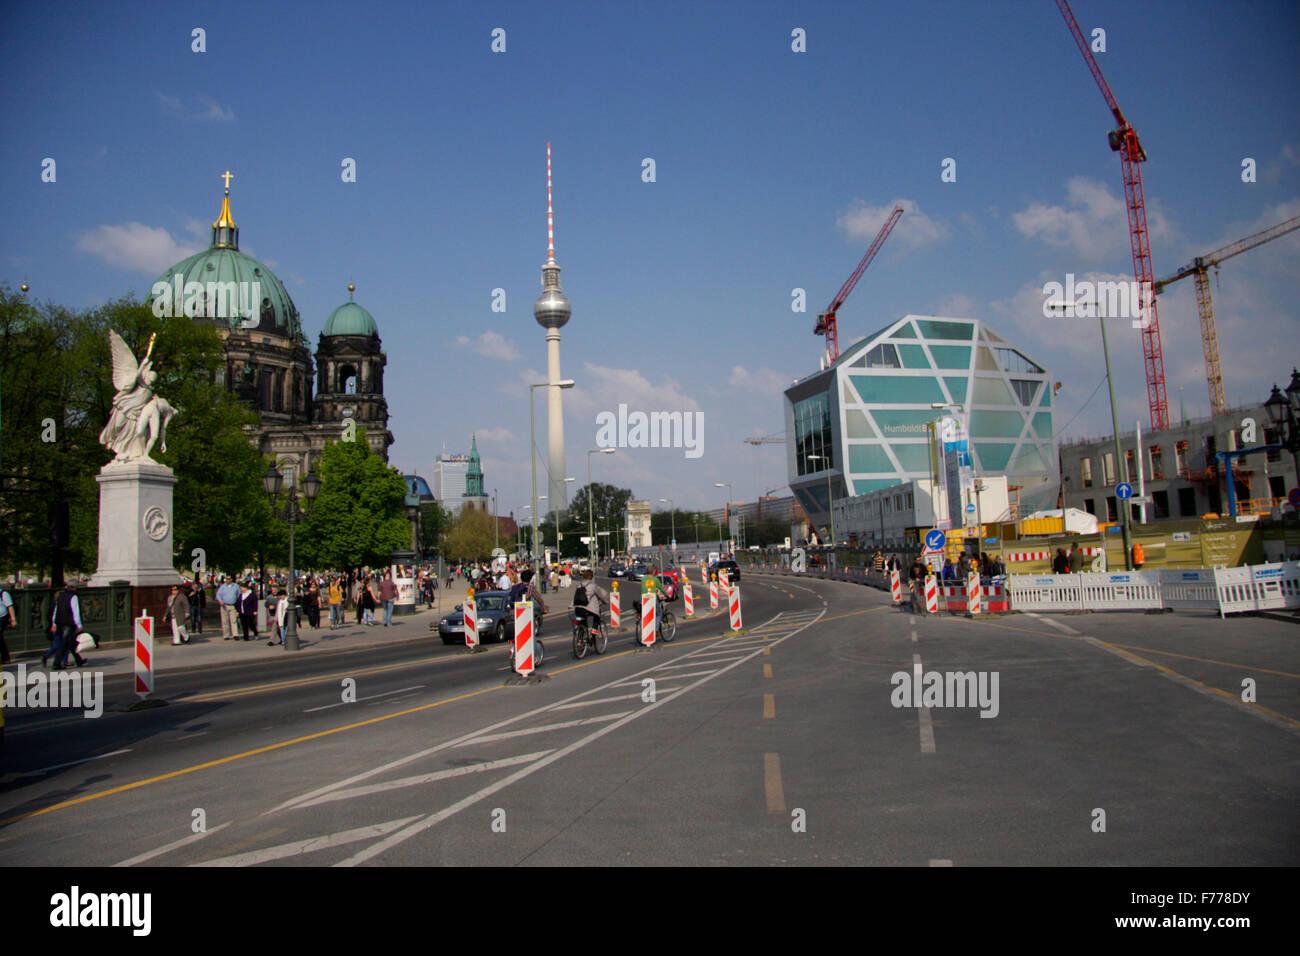 Strassenszene: Schlossbruecke, Berliner Dom, Fernsehturm, Humboldt Box, Berlin-Mitte. - Stock Image